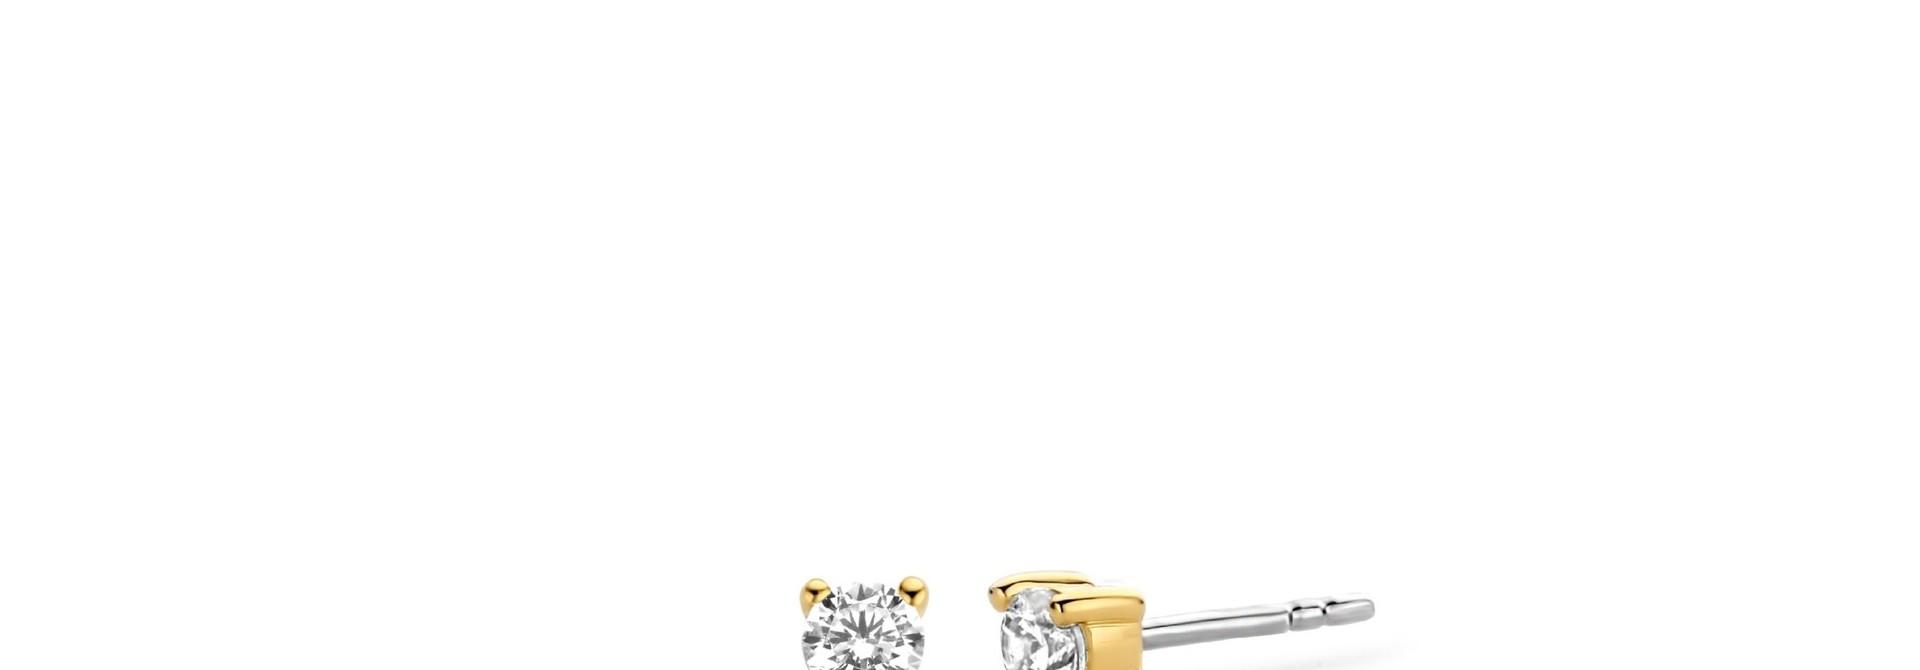 TI SENTO - Milano Earrings 7836ZY